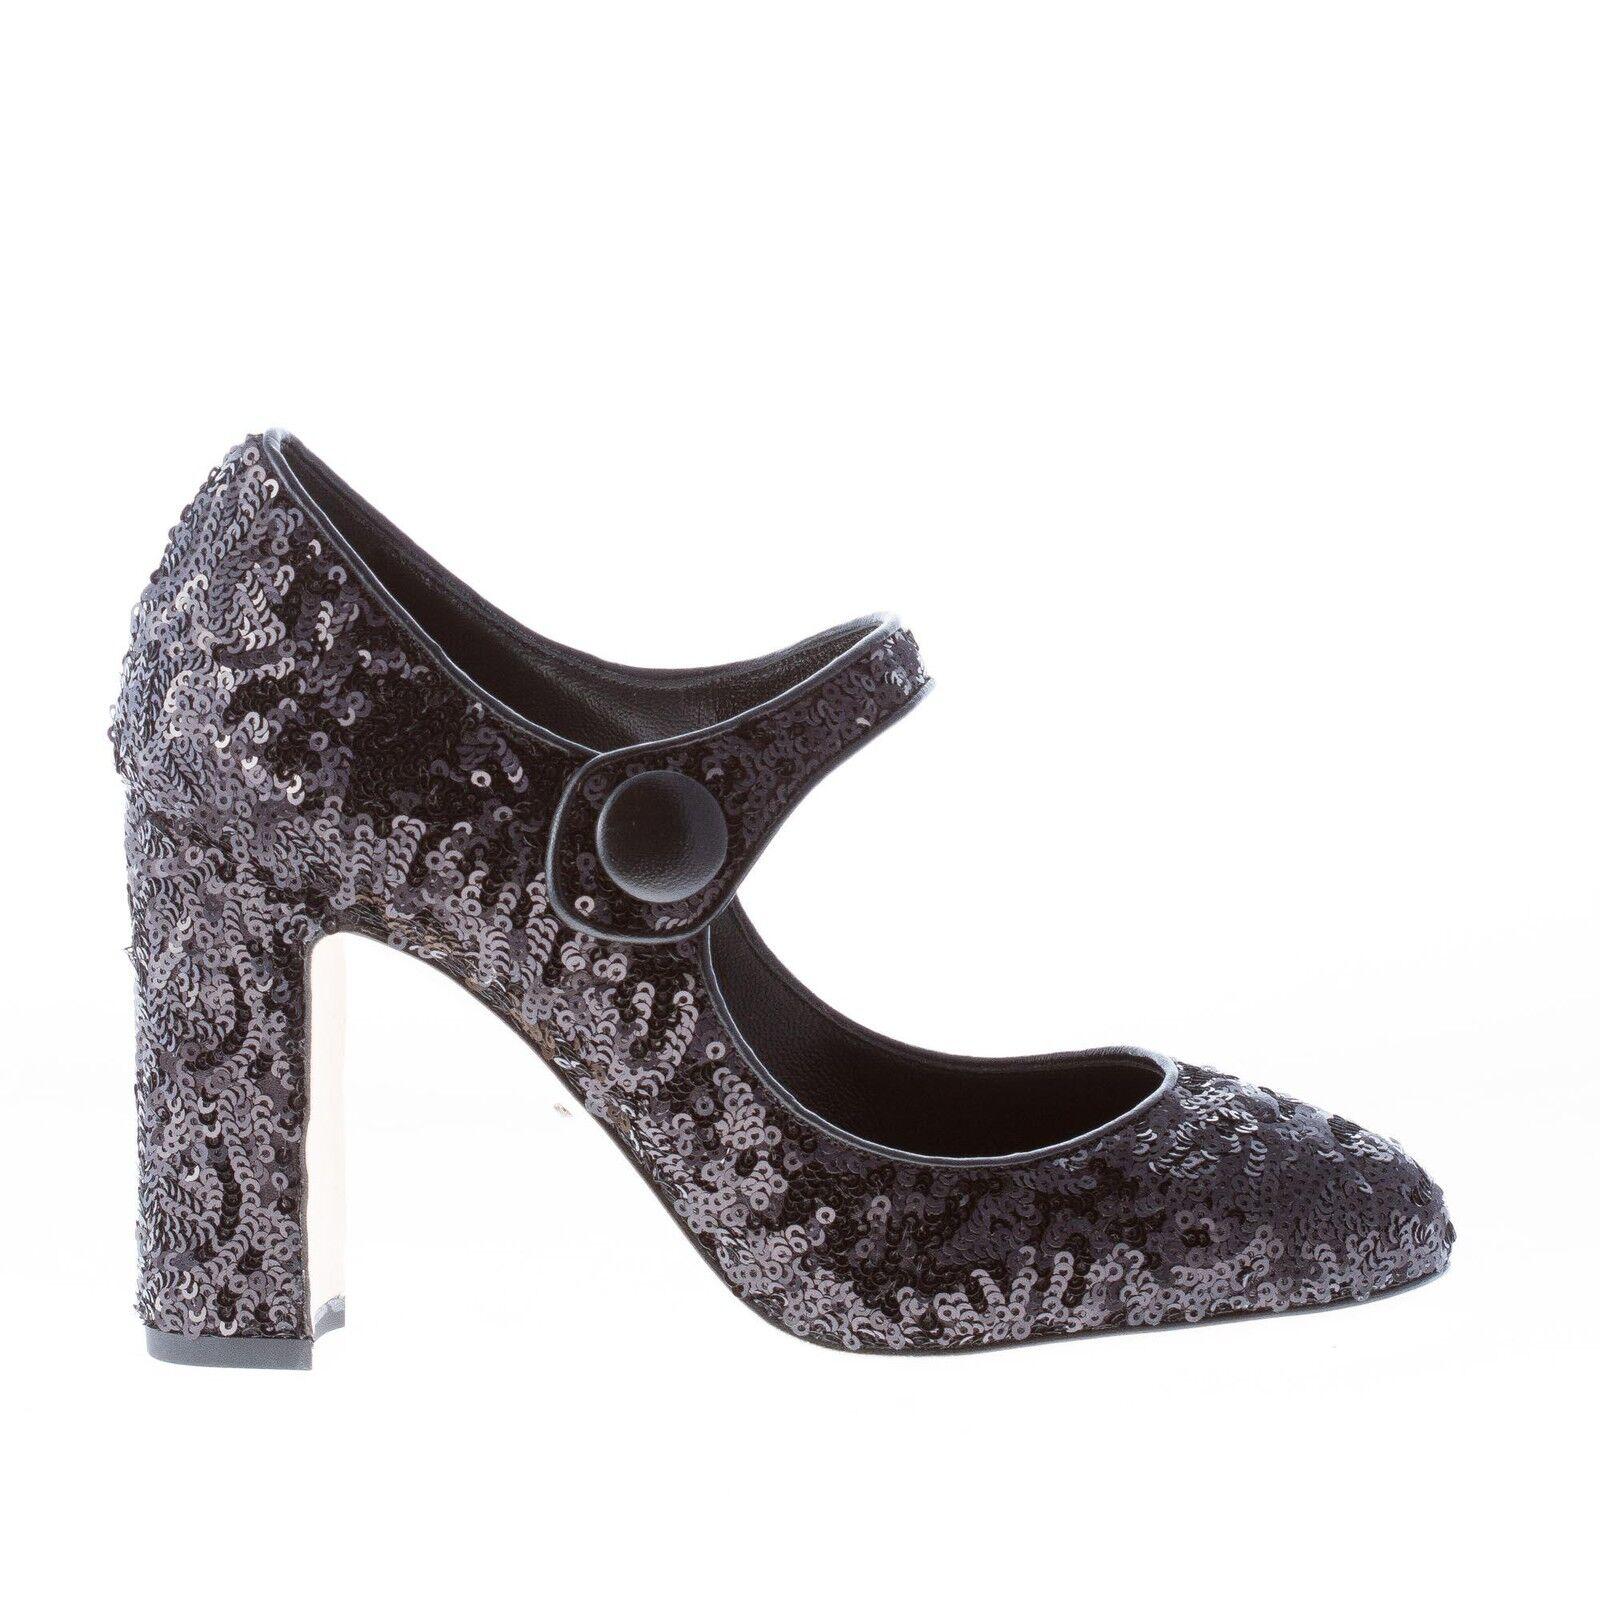 DOLCE & GABBANA damen schuhe women shoes Black sequins Mary Jane pump